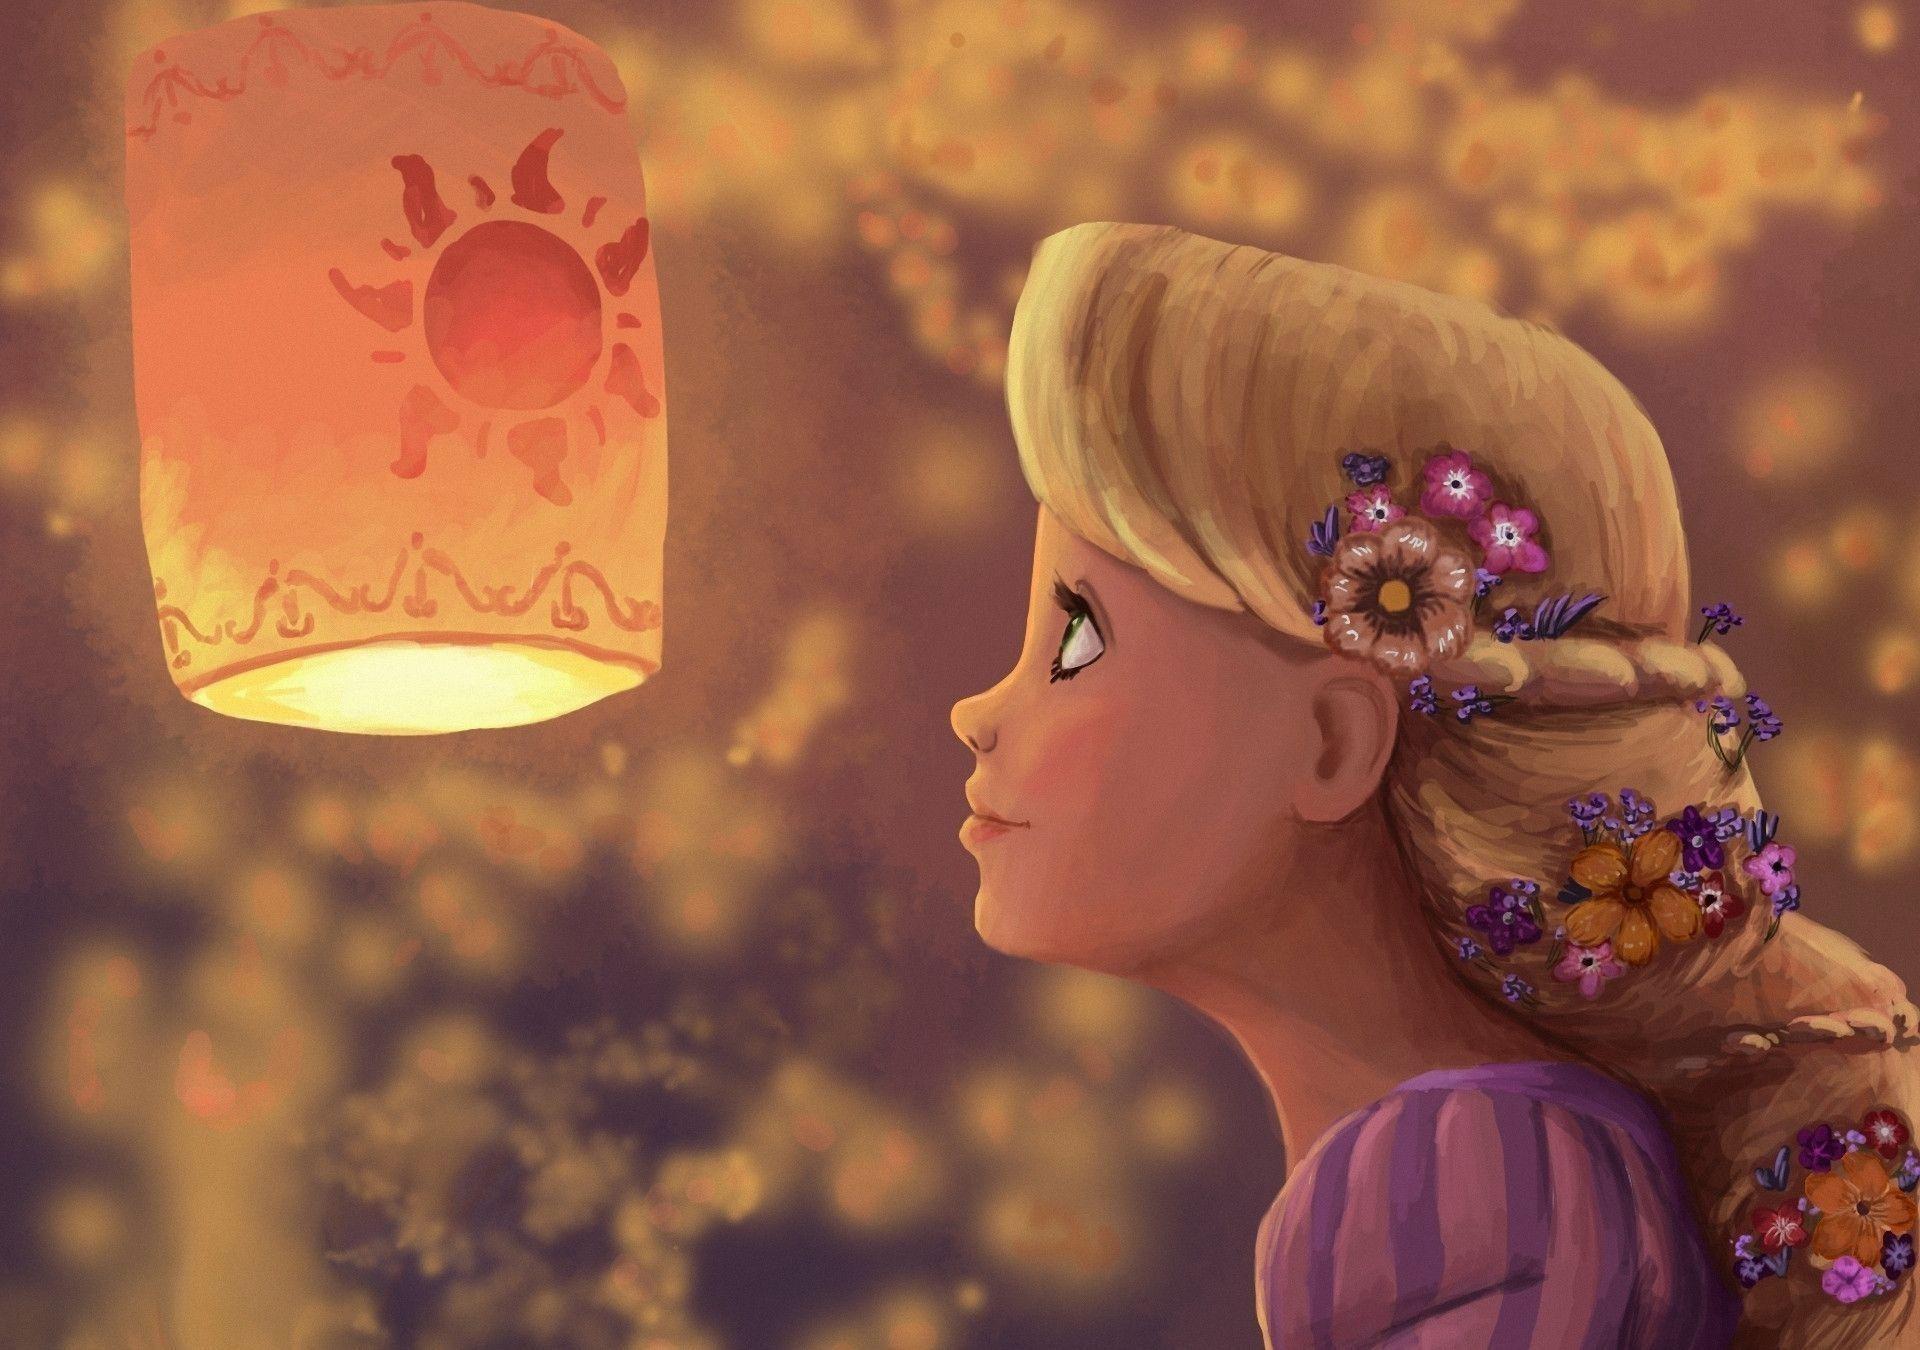 wallpaper.wiki-Disney-Tangled-Images-PIC-WPD008760